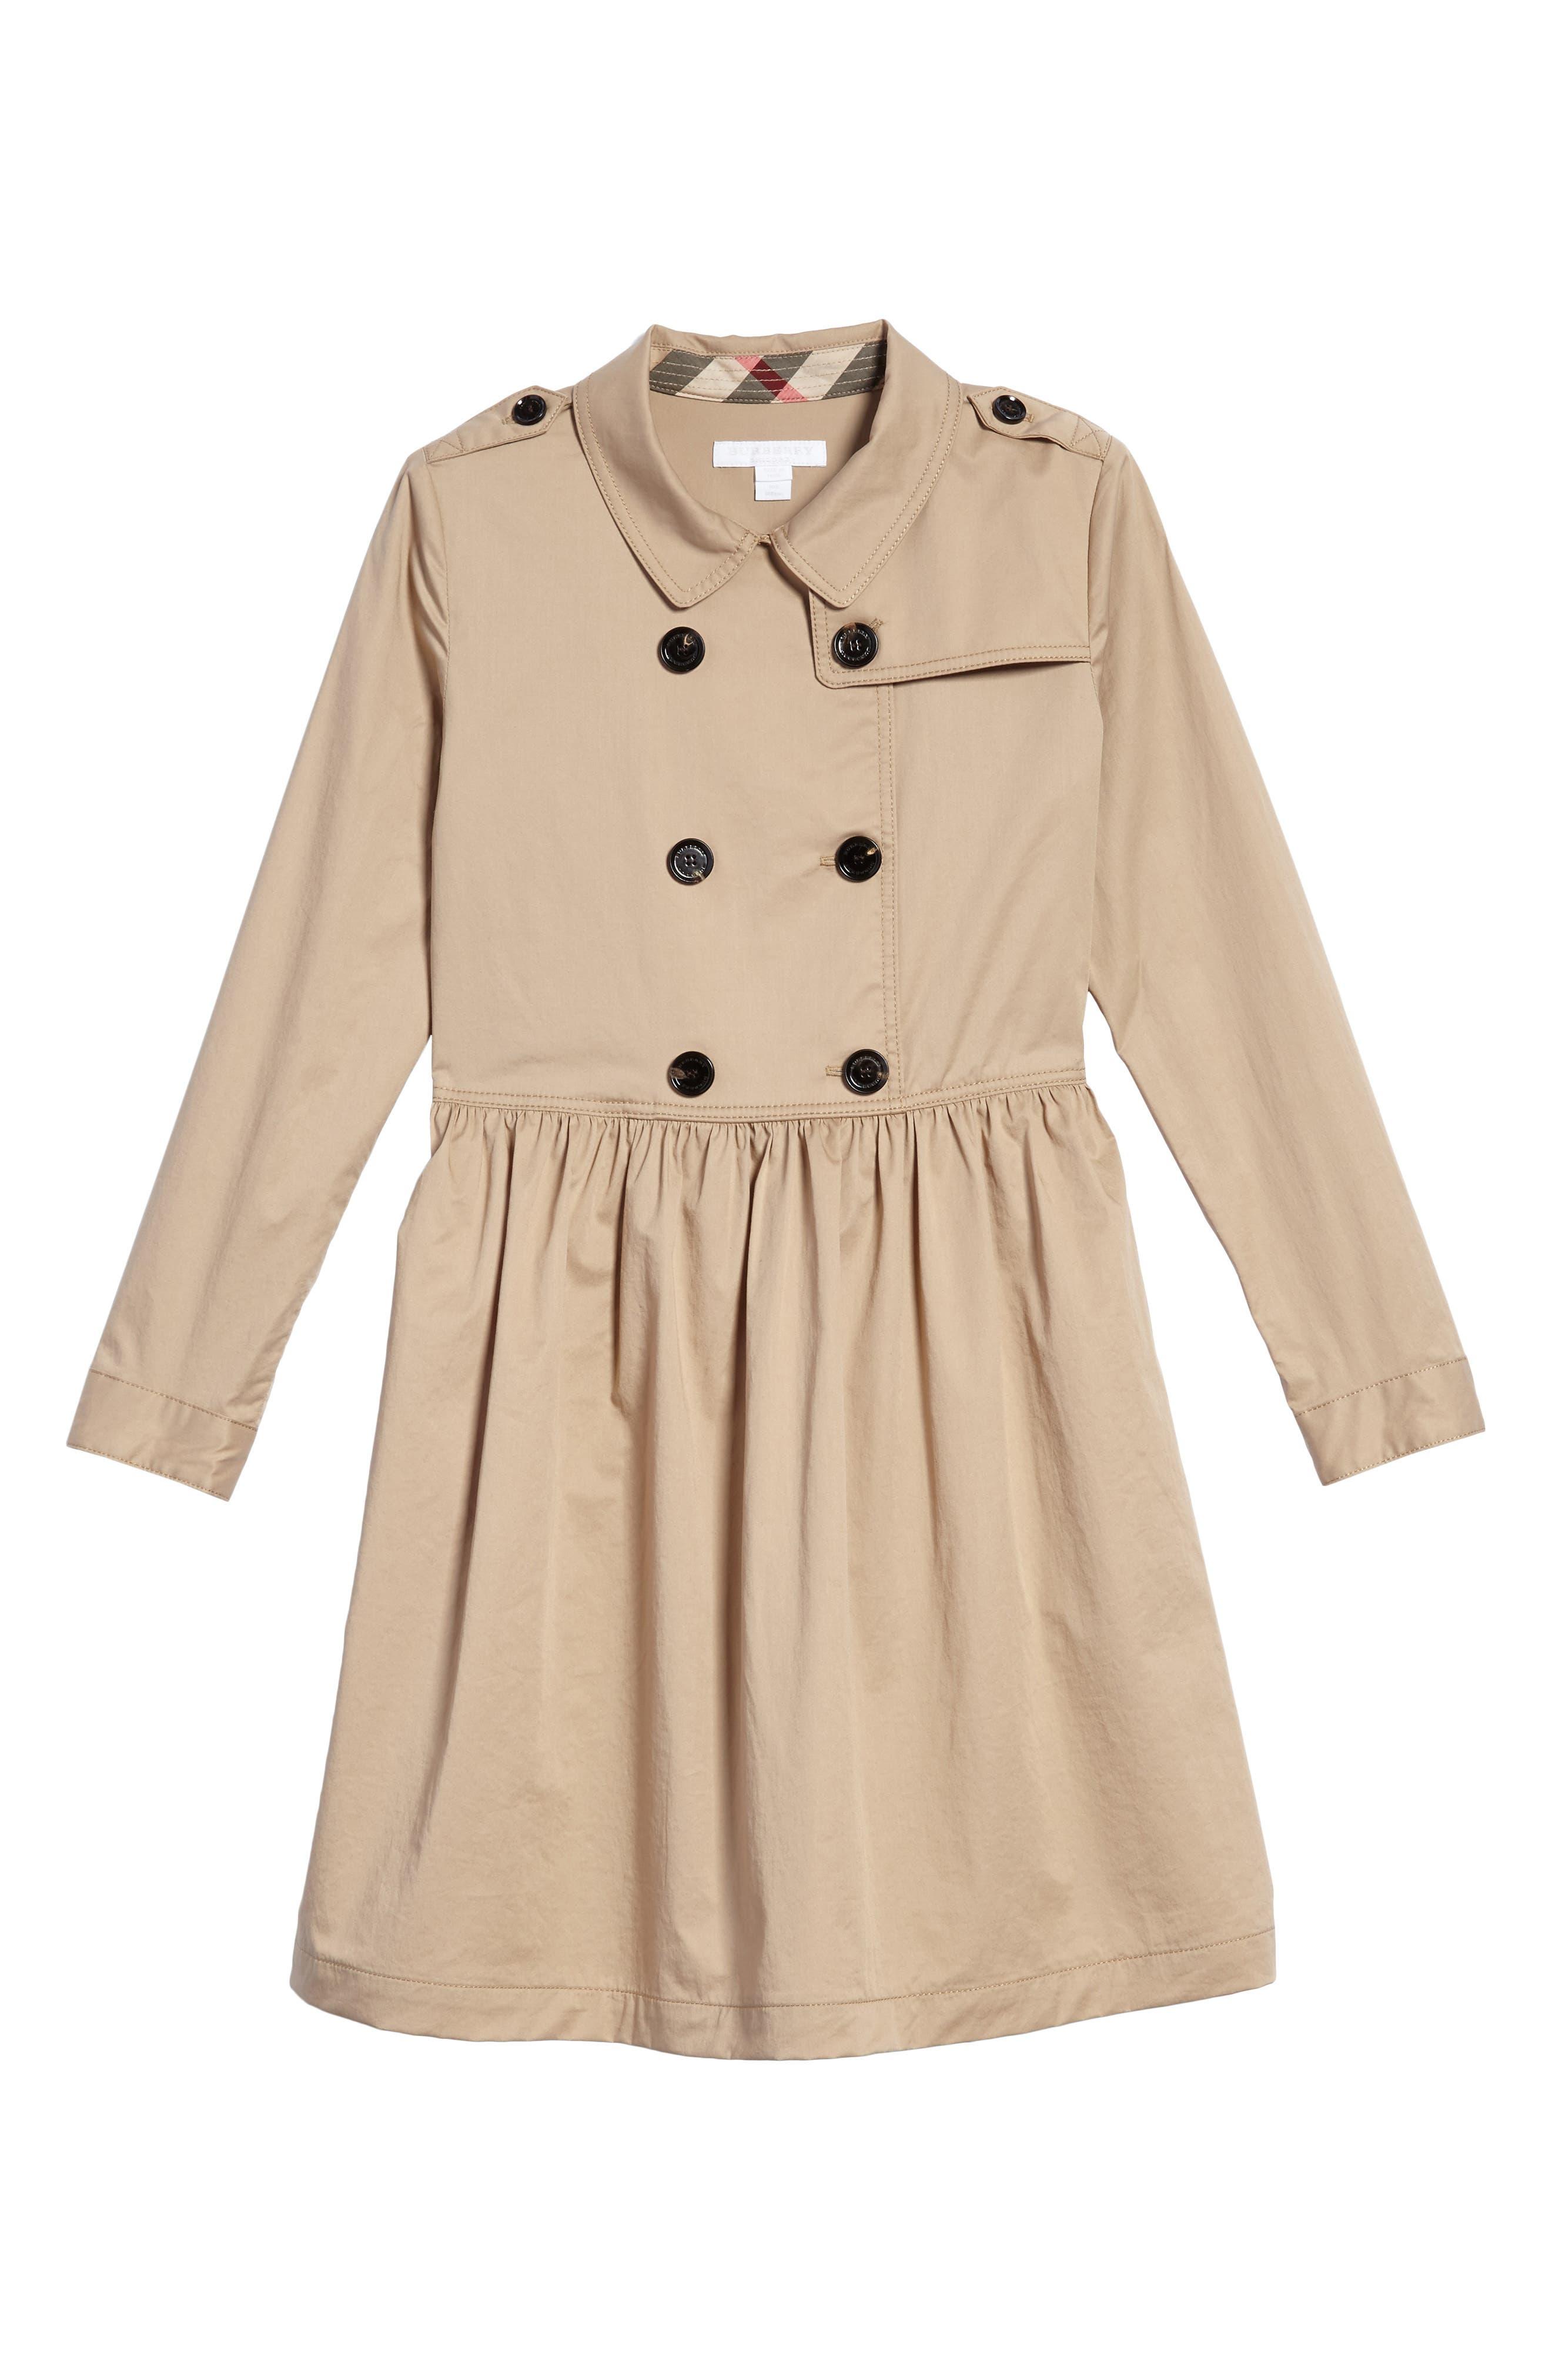 Lillyana Trench Dress,                             Main thumbnail 1, color,                             255